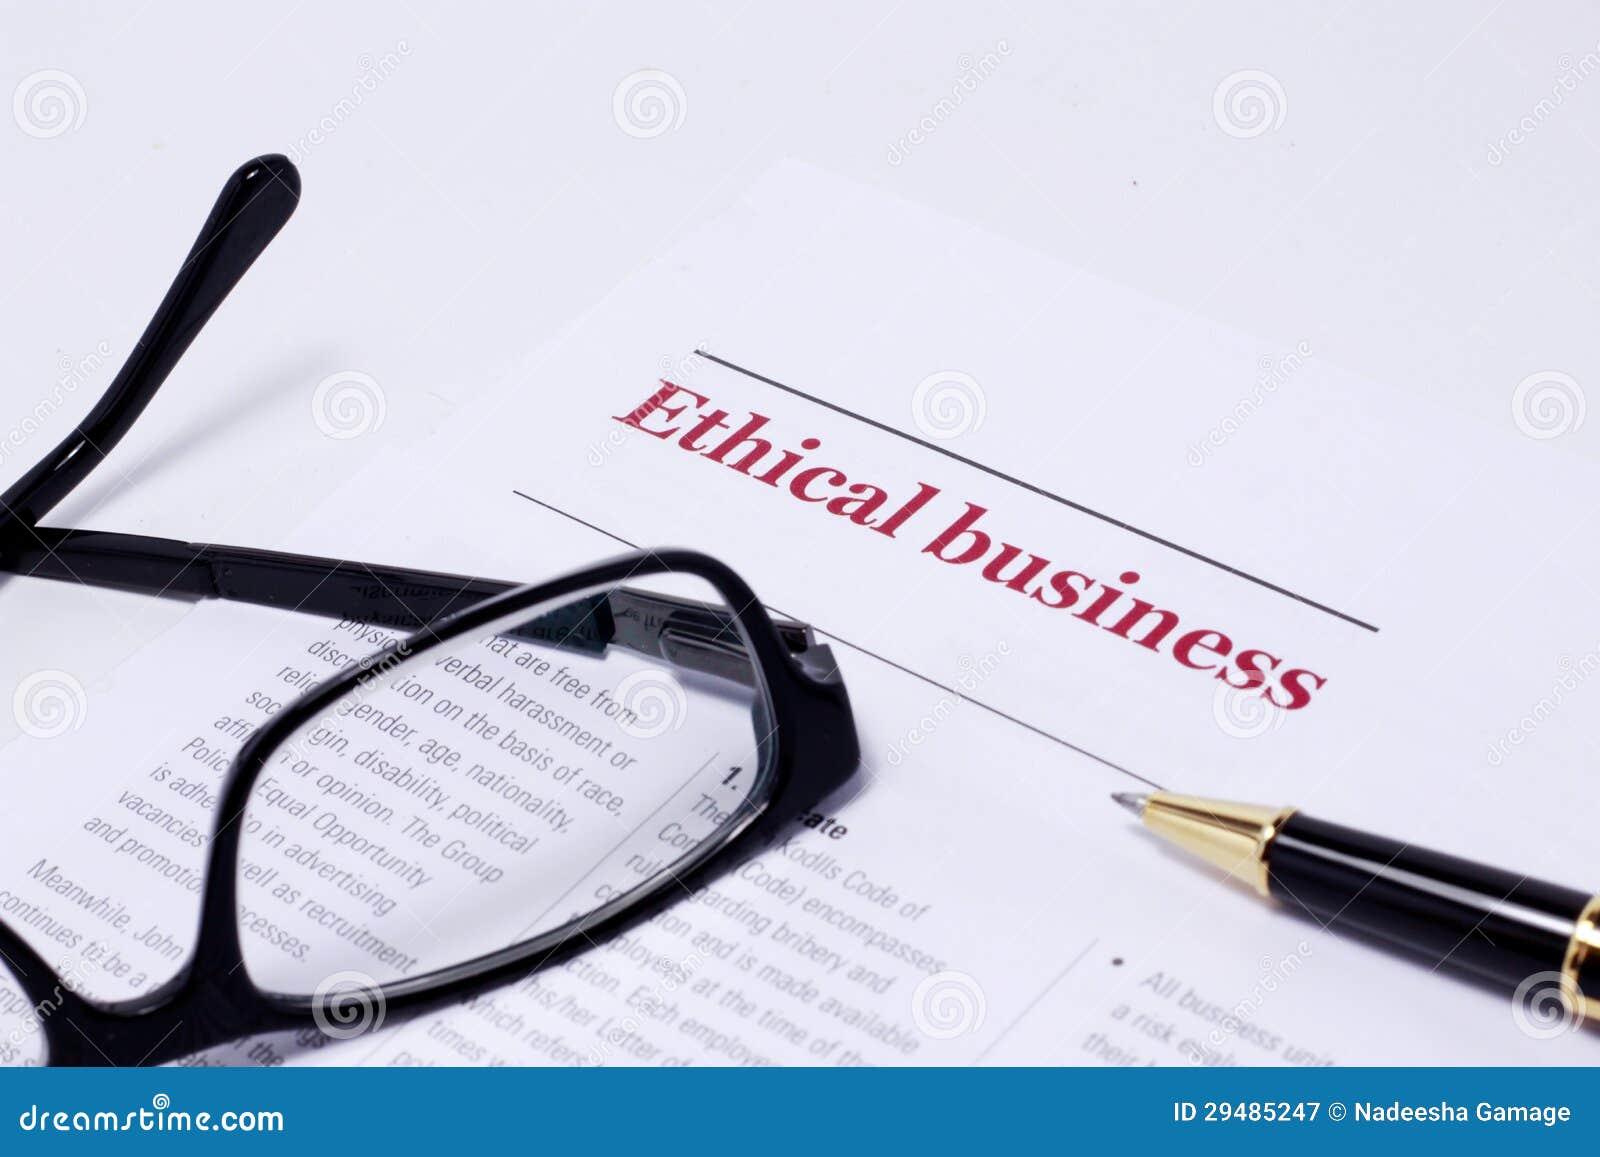 Undergraduate Business Law and Ethics Curriculum